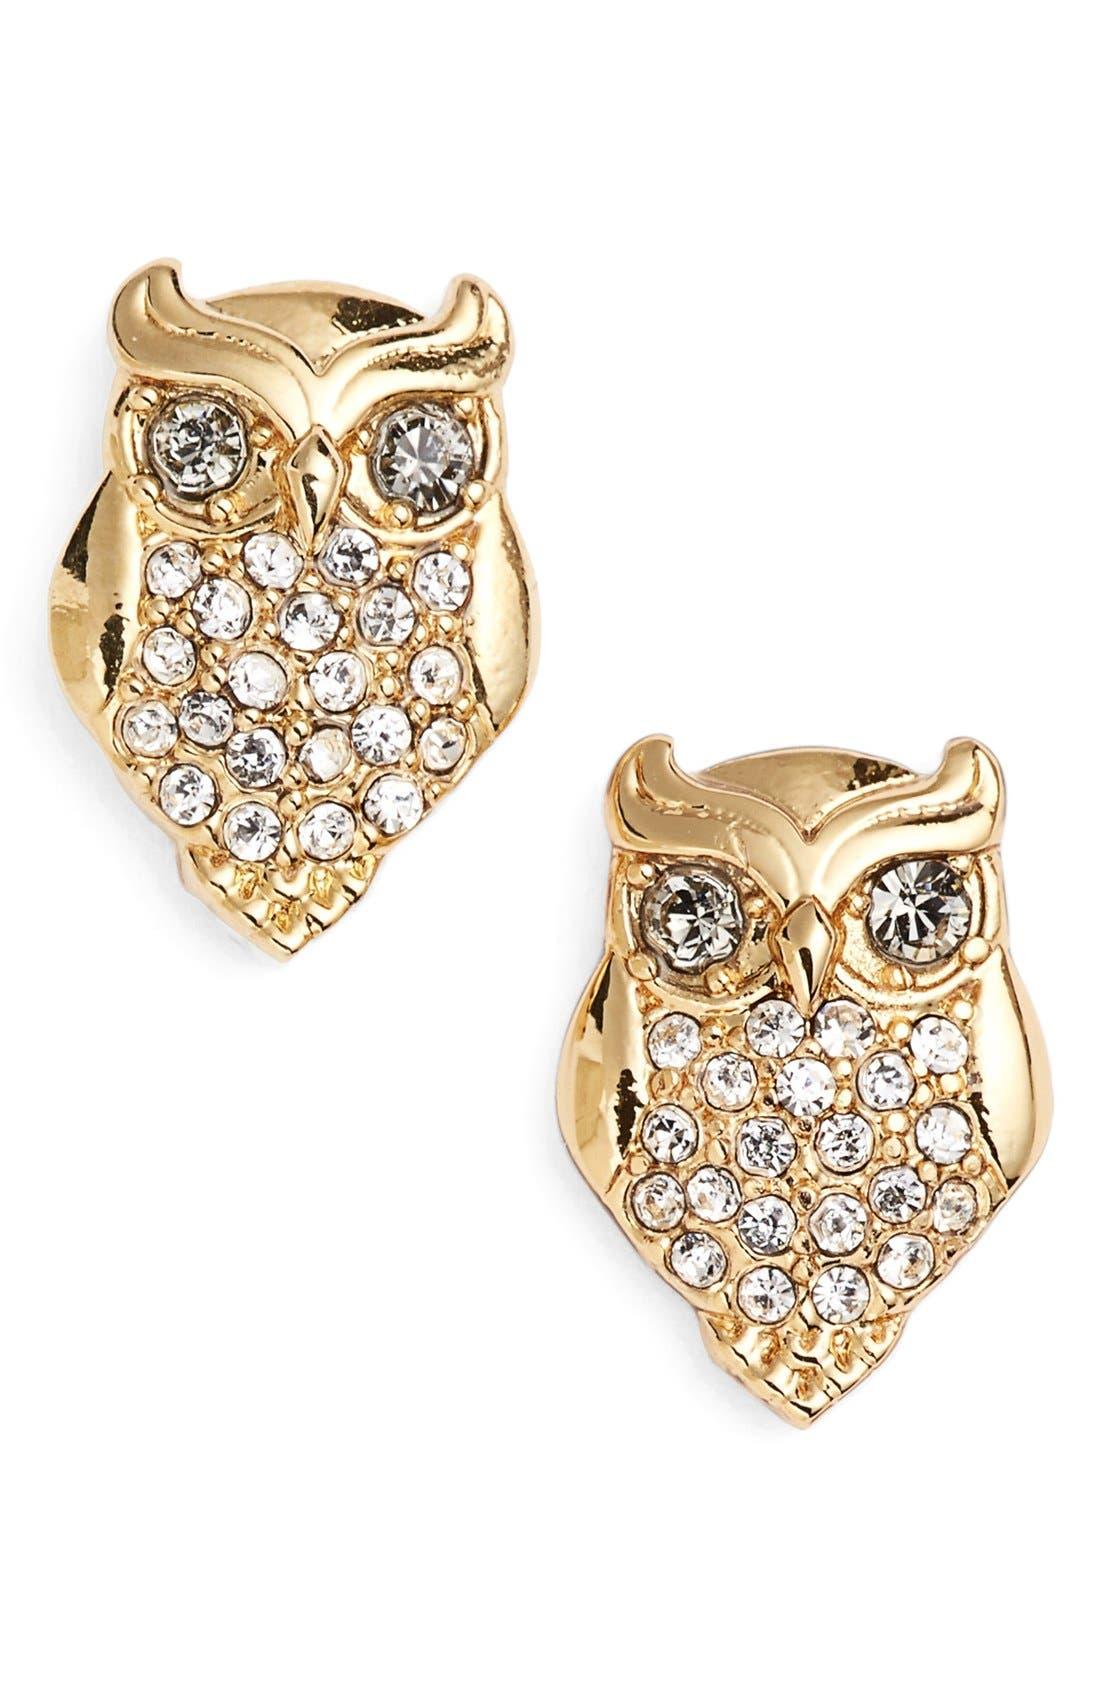 Main Image - katespade new yorkowl stud earrings